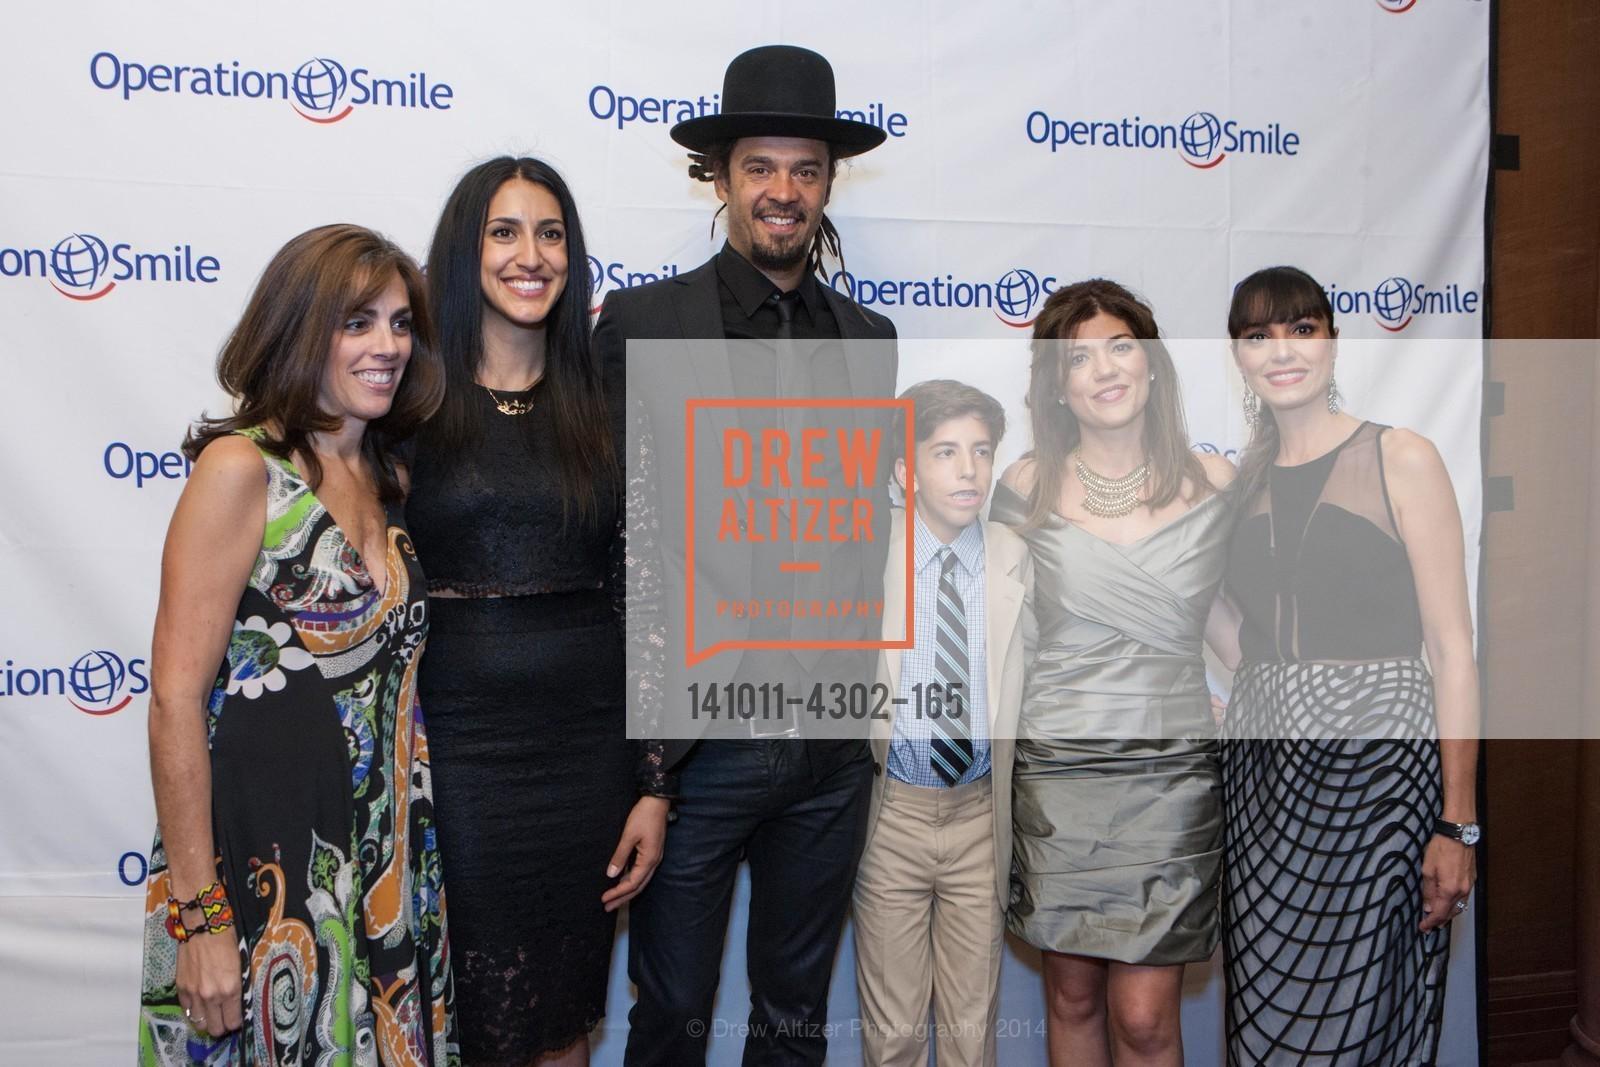 Lisa Lori, Sara Agah, Michael Franti, Griffin Lori, Shab Farzaneh, Shirin Aryanpour, Photo #141011-4302-165